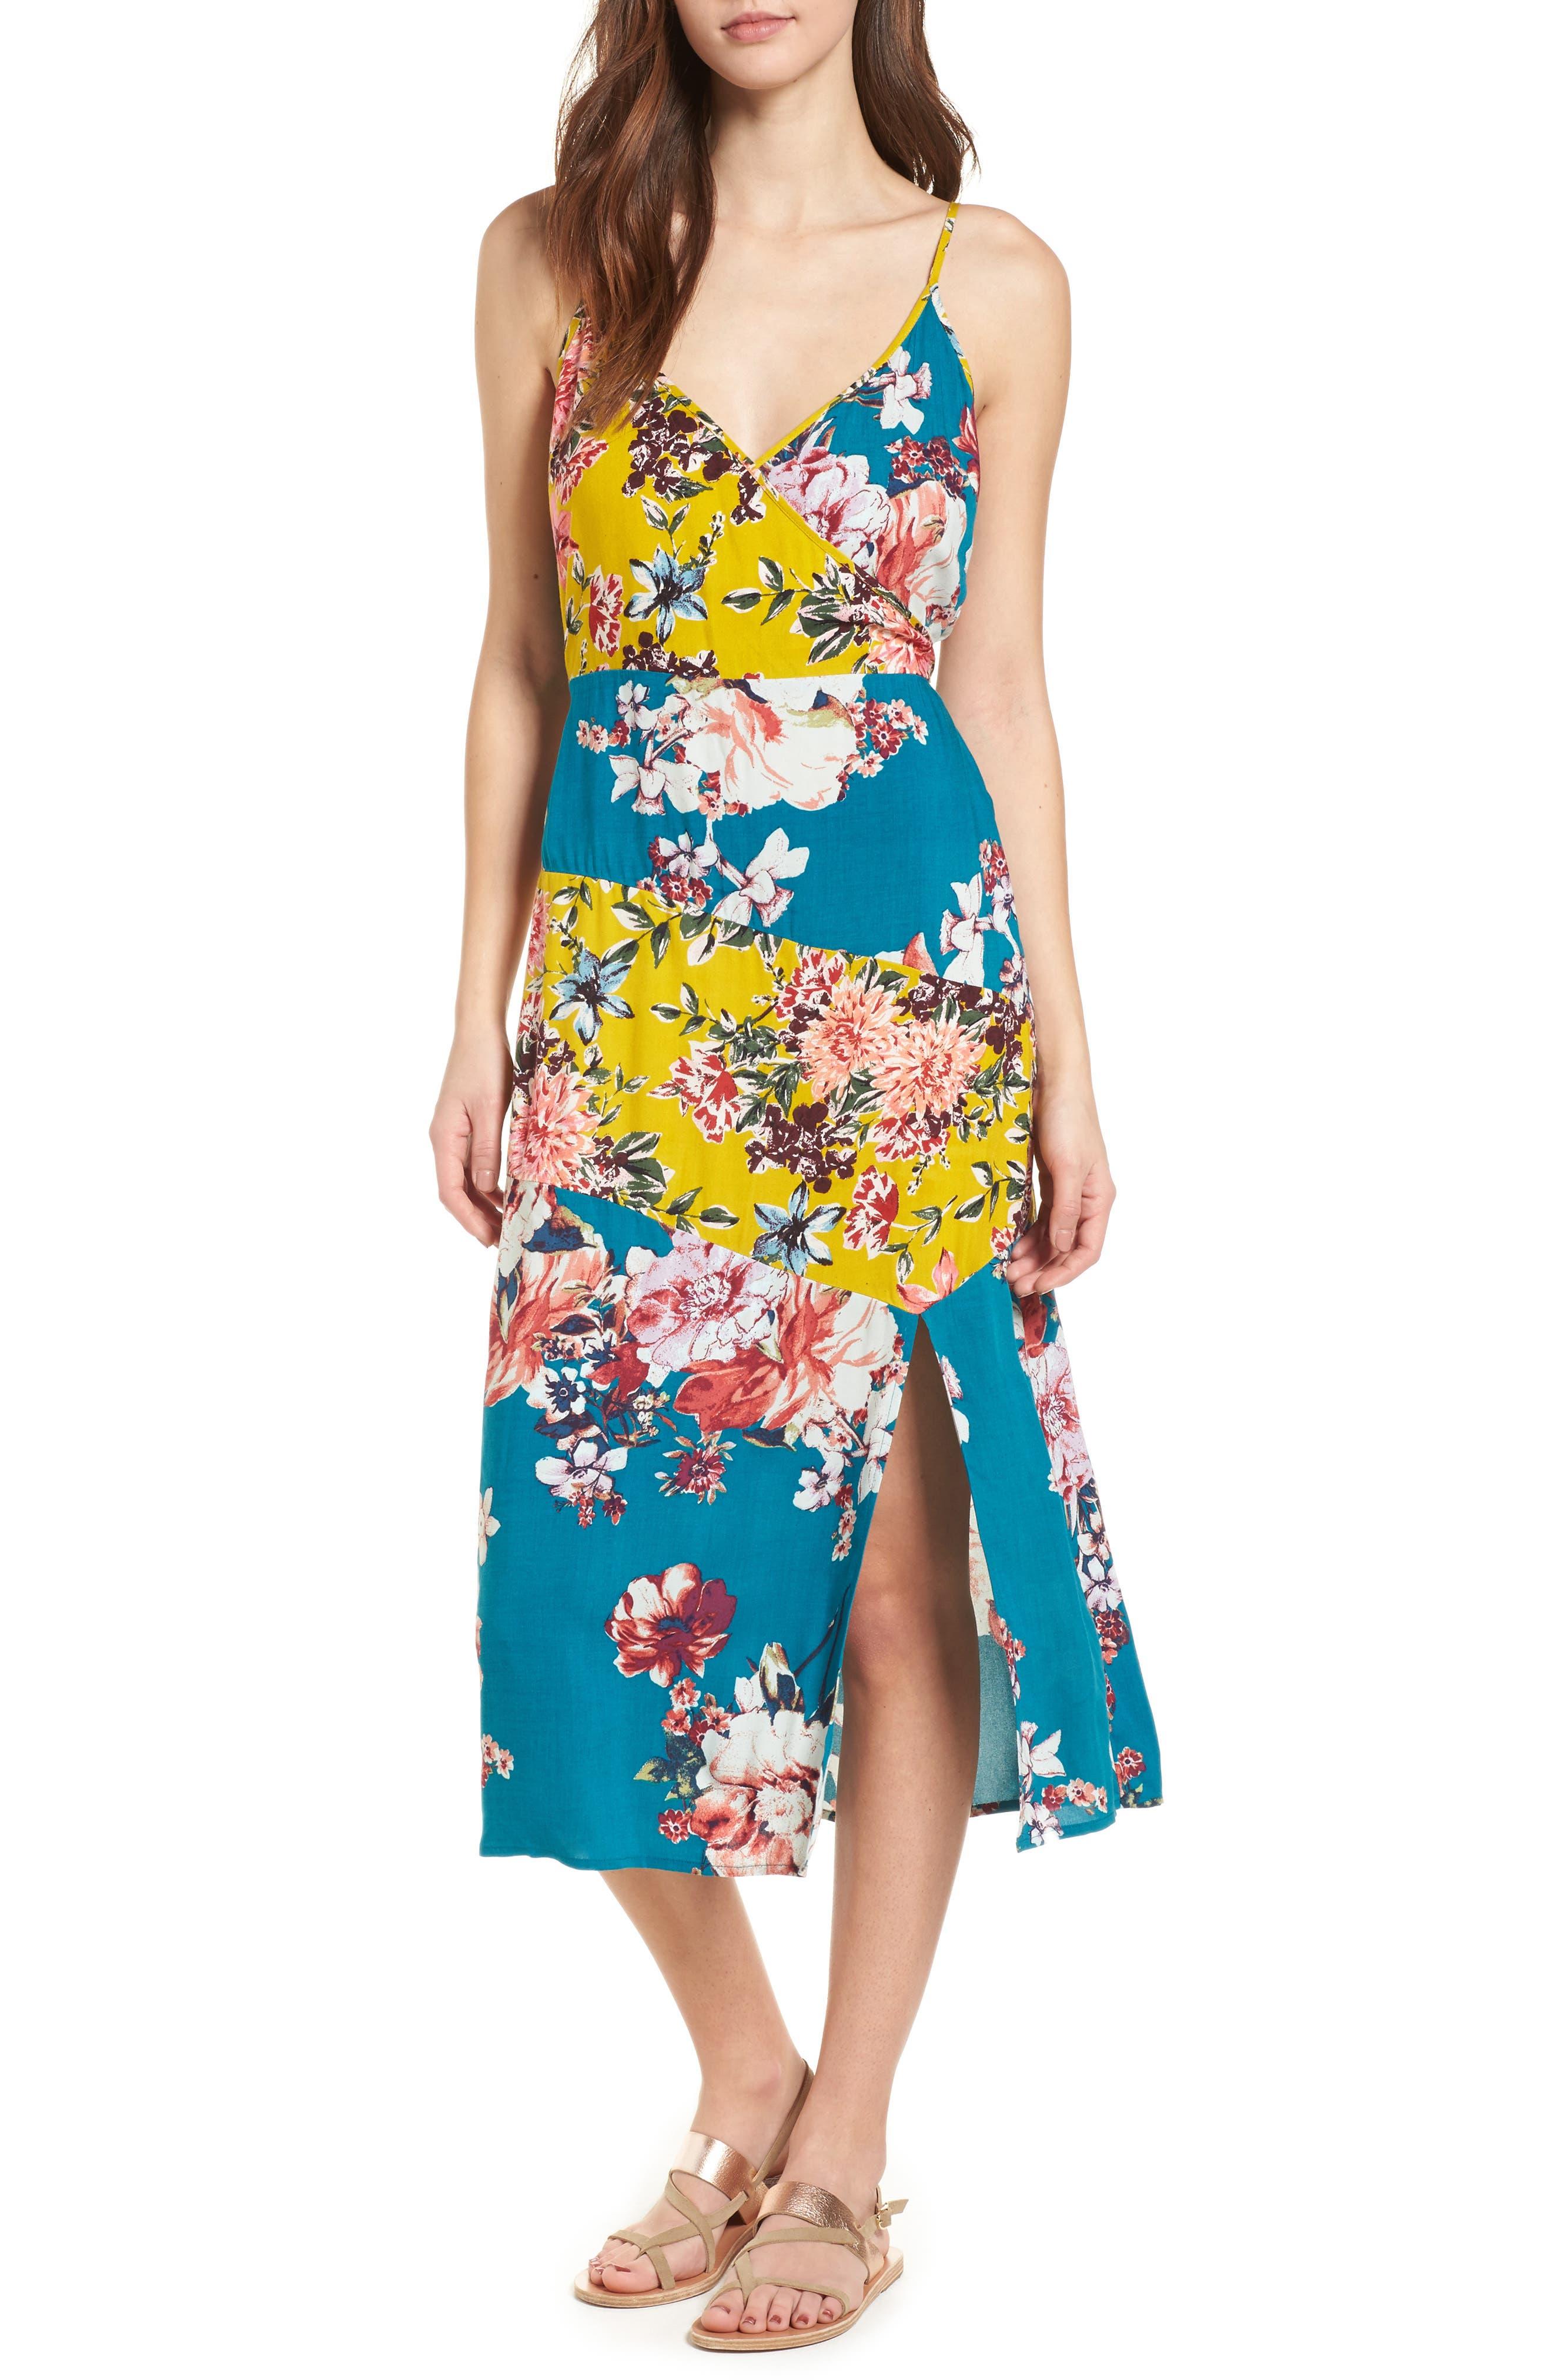 Band of Gypsies Mix Floral Midi Dress